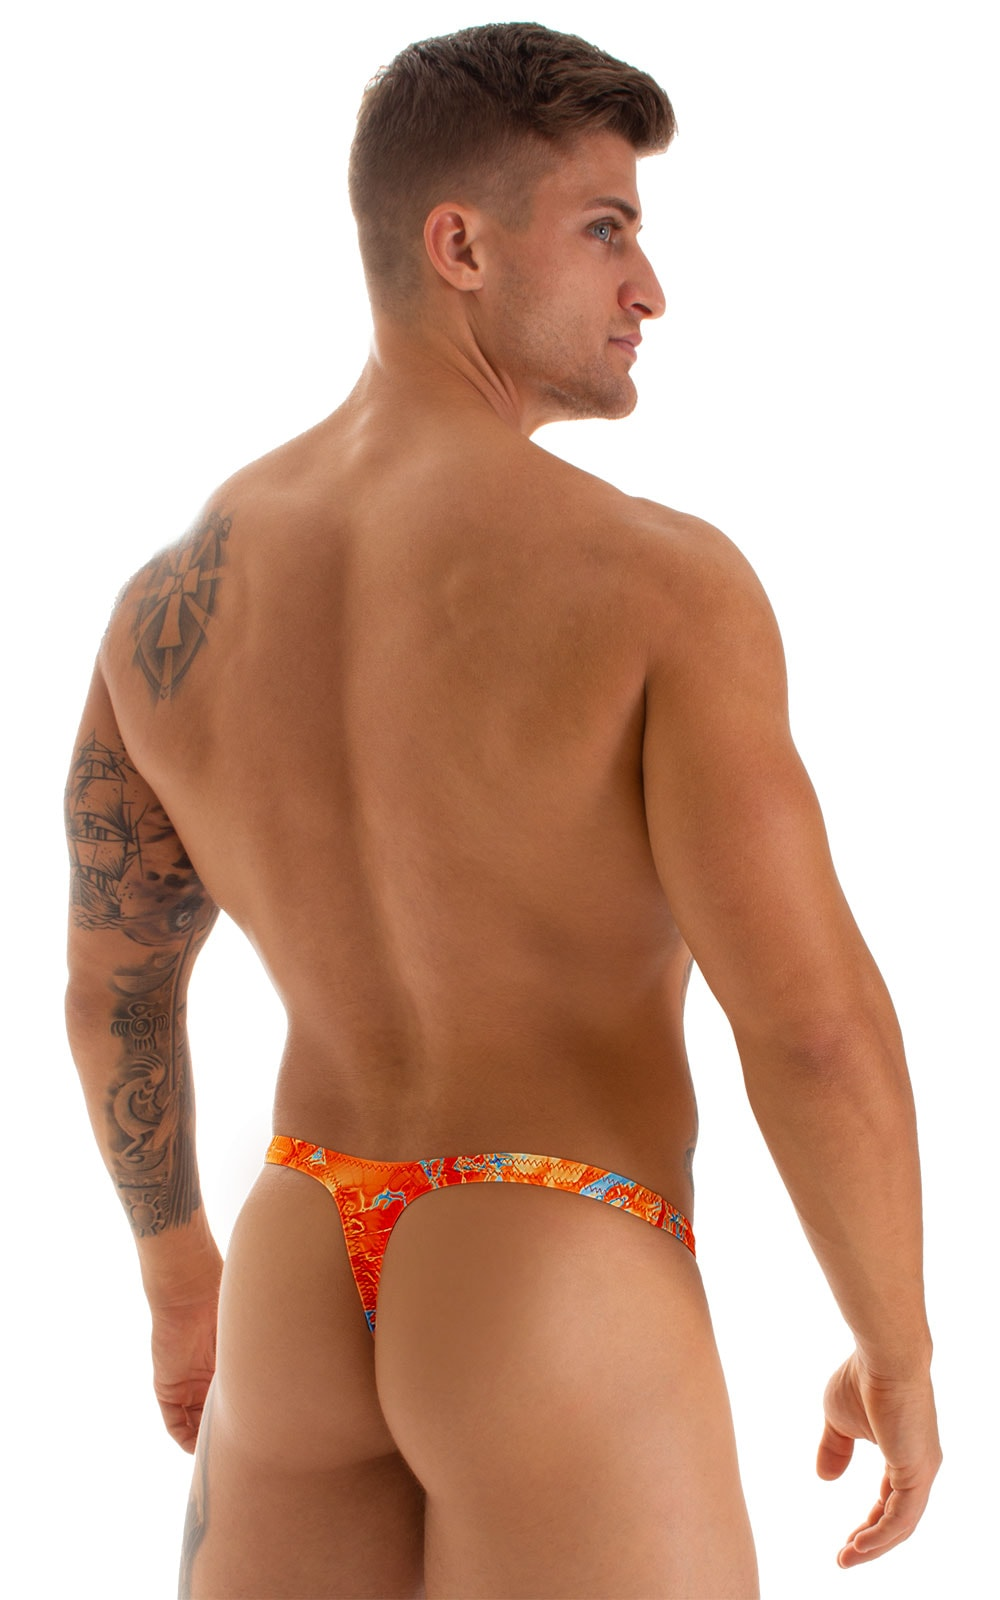 T Back Thong Swimsuit - Bravura Pouch in Vapor Wave Orange 2